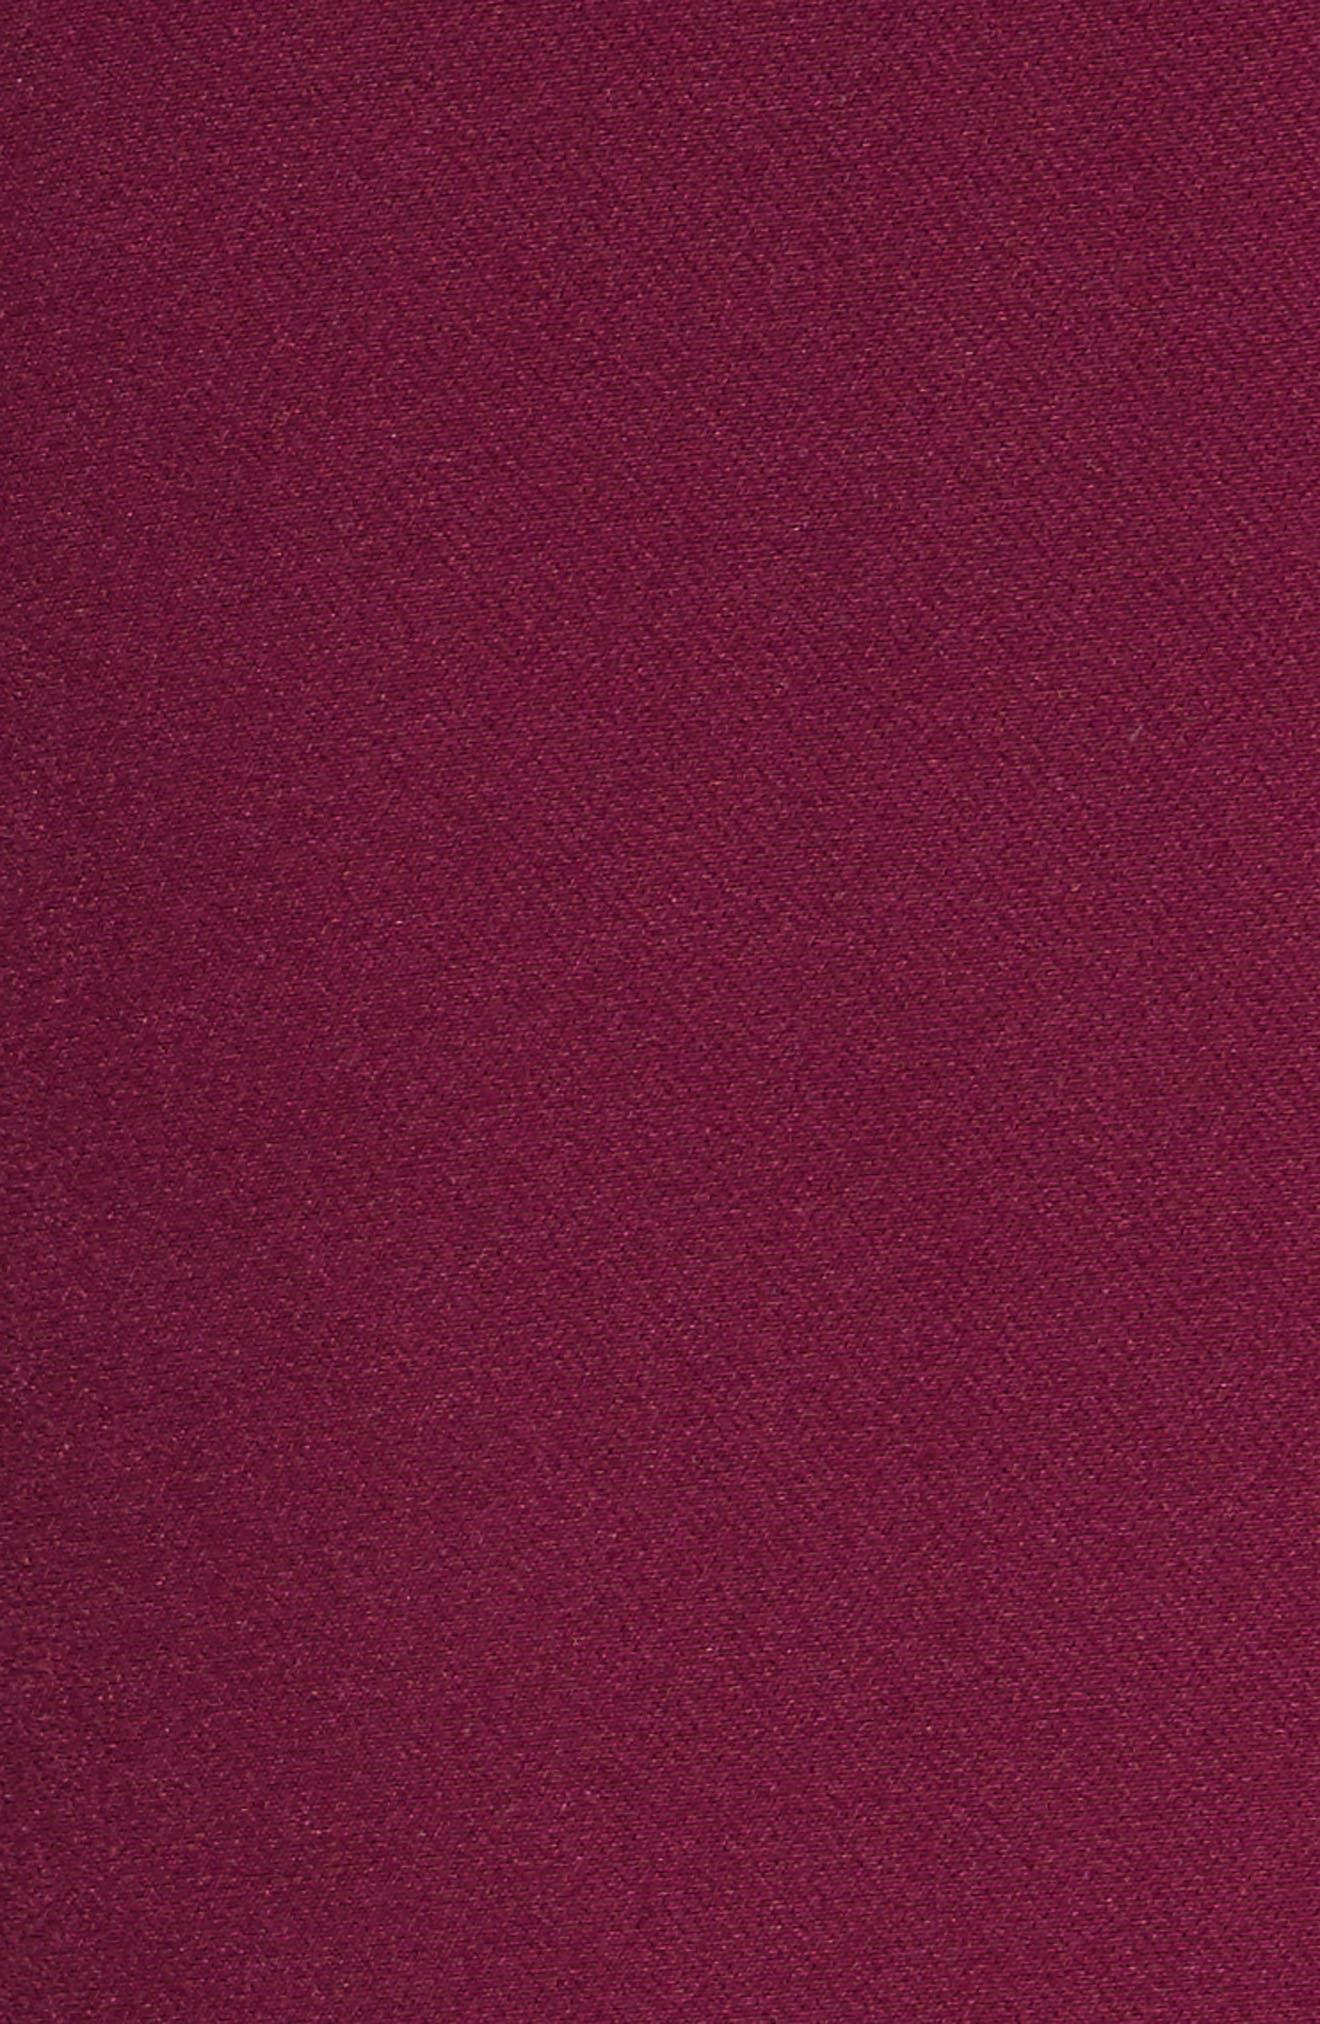 Andrea Italian Cady A-Line Dress,                             Alternate thumbnail 5, color,                             931